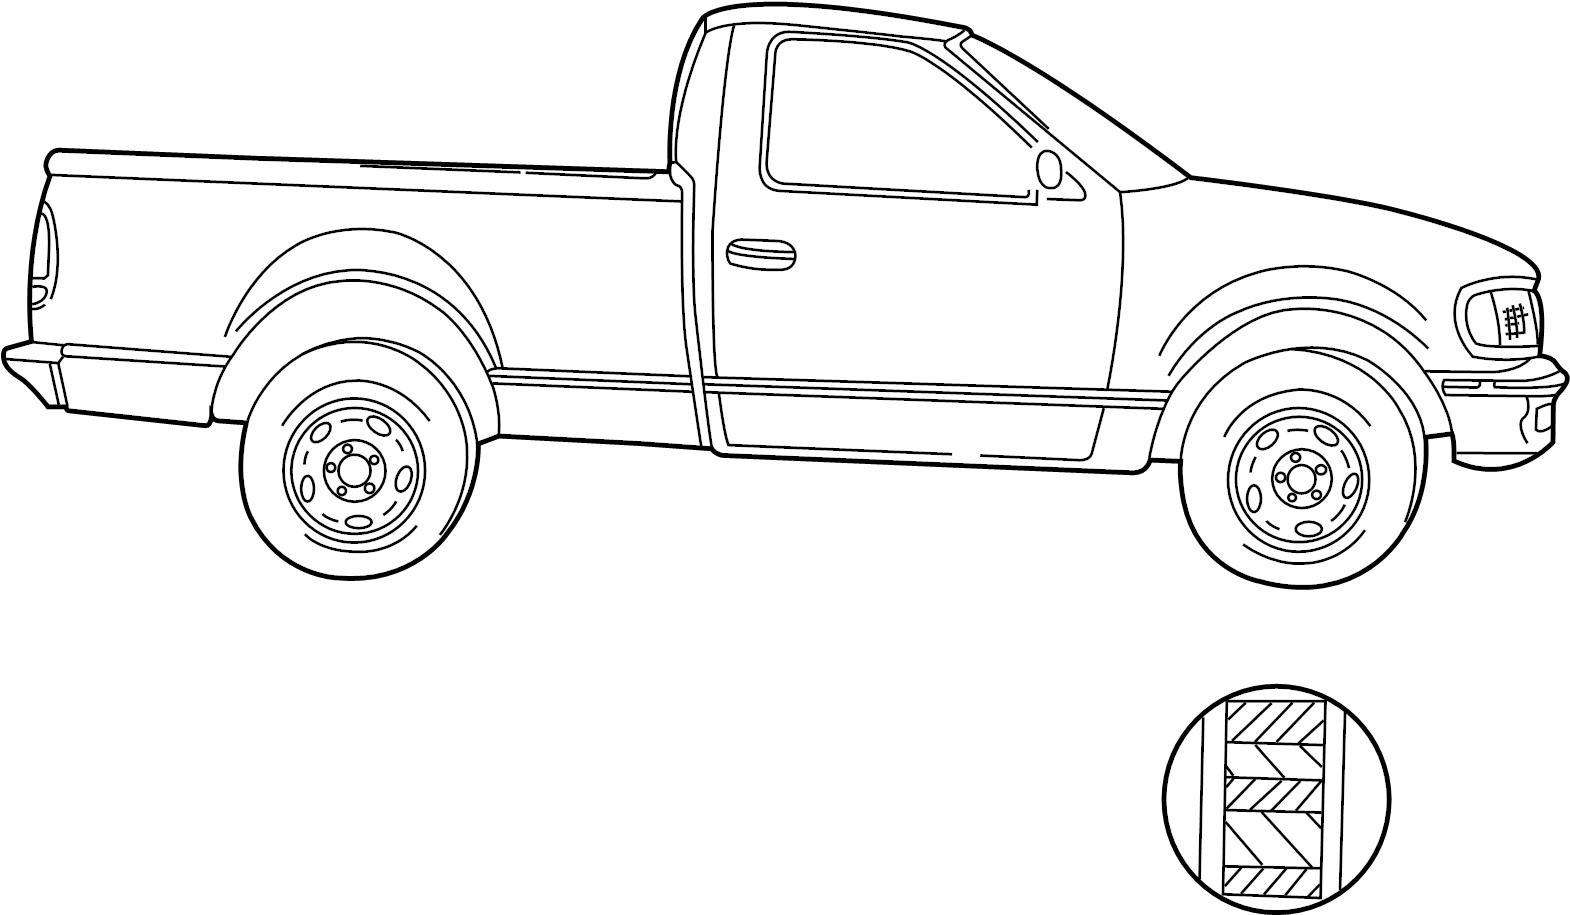 Ford F 150 Trim Stripe Tape 2wd Xl Amp Xlt 2wd 6 1 2